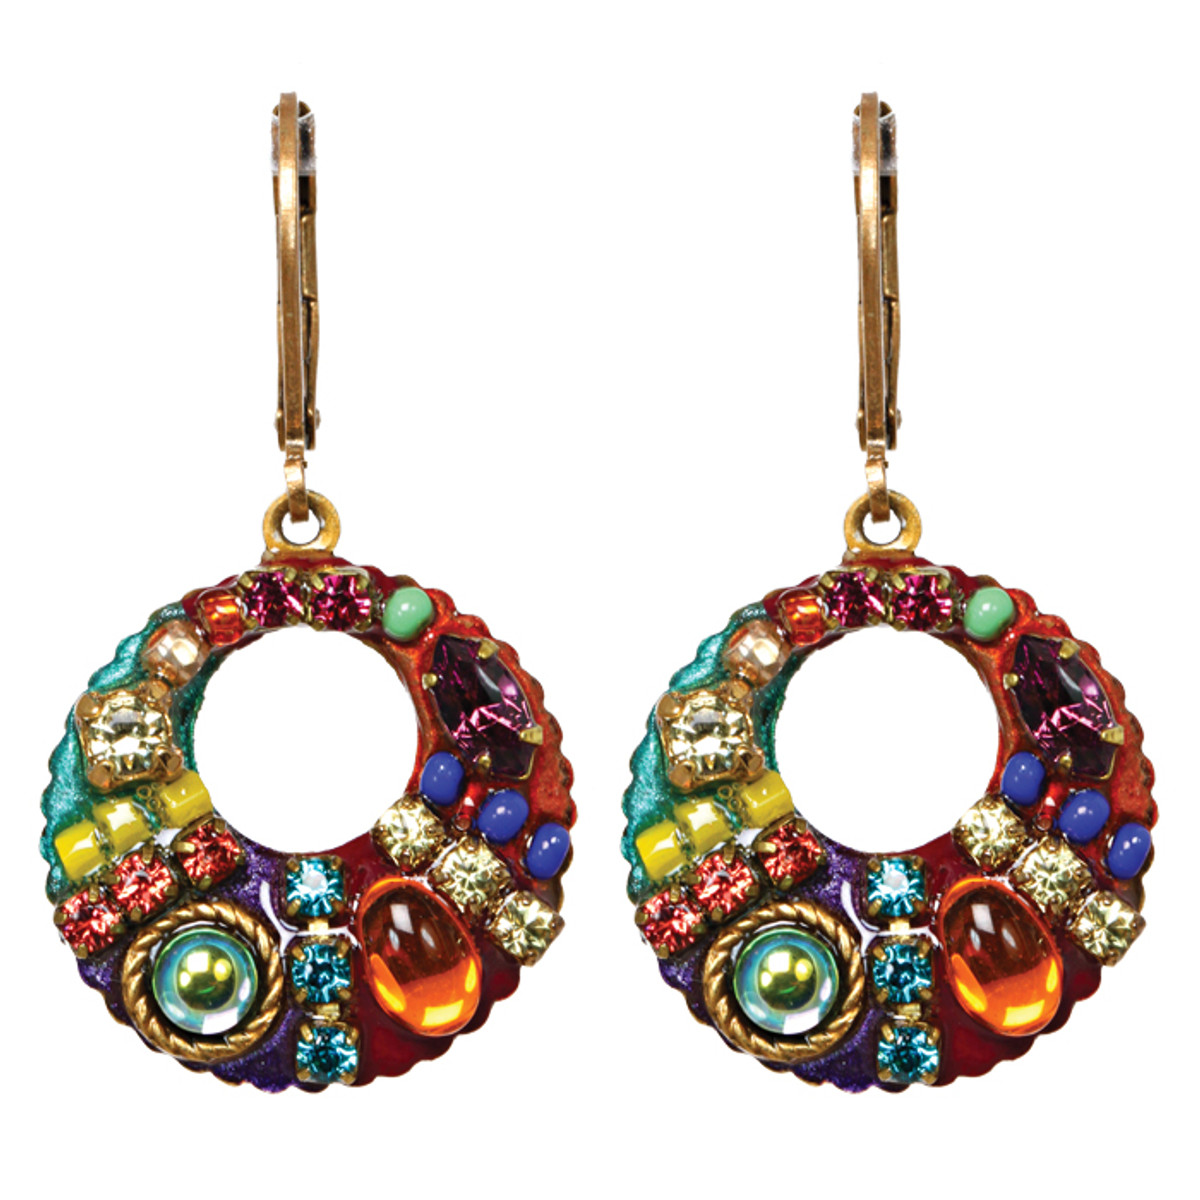 Michal Golan Earrings - Multibright Small Dangle Hoop